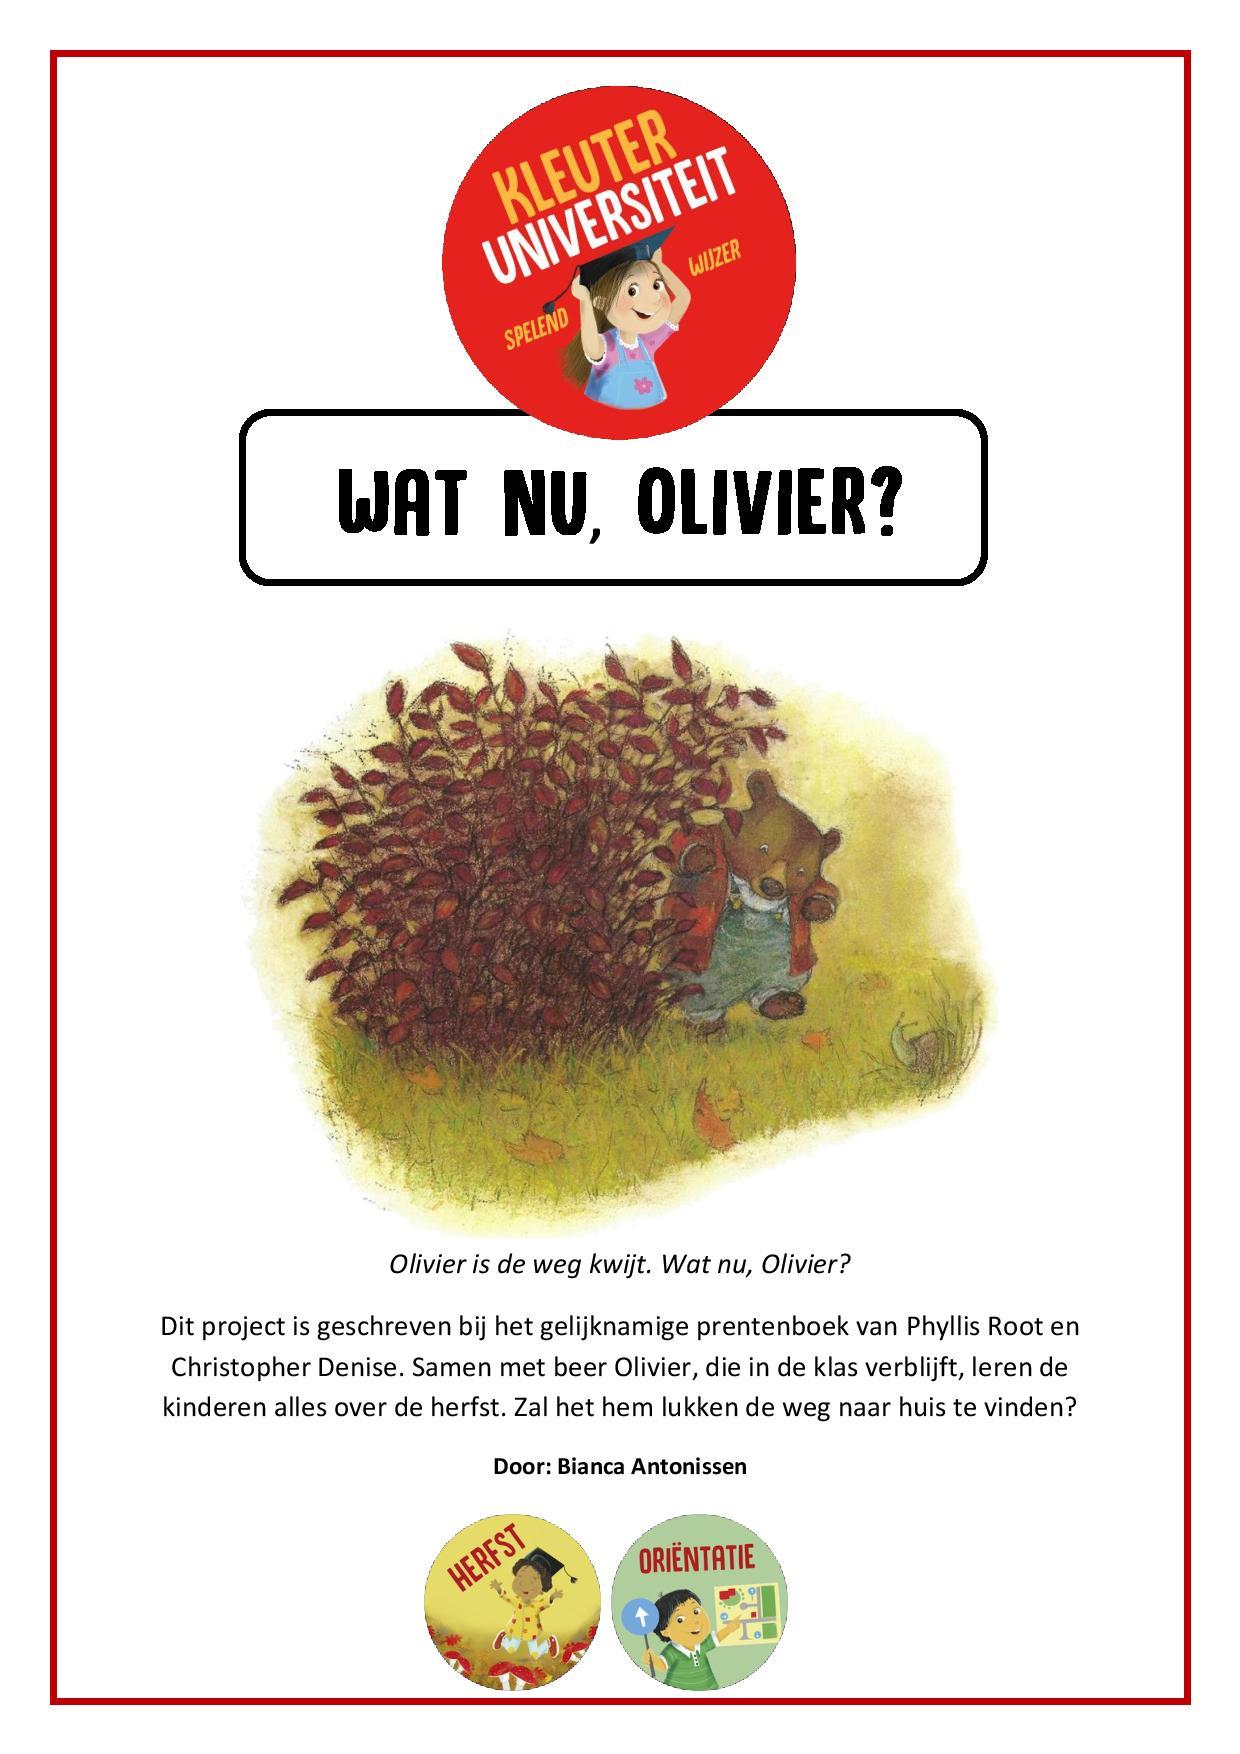 Wat nu, Olivier - project van Juf Bianca bij Kleuteruniversiteit